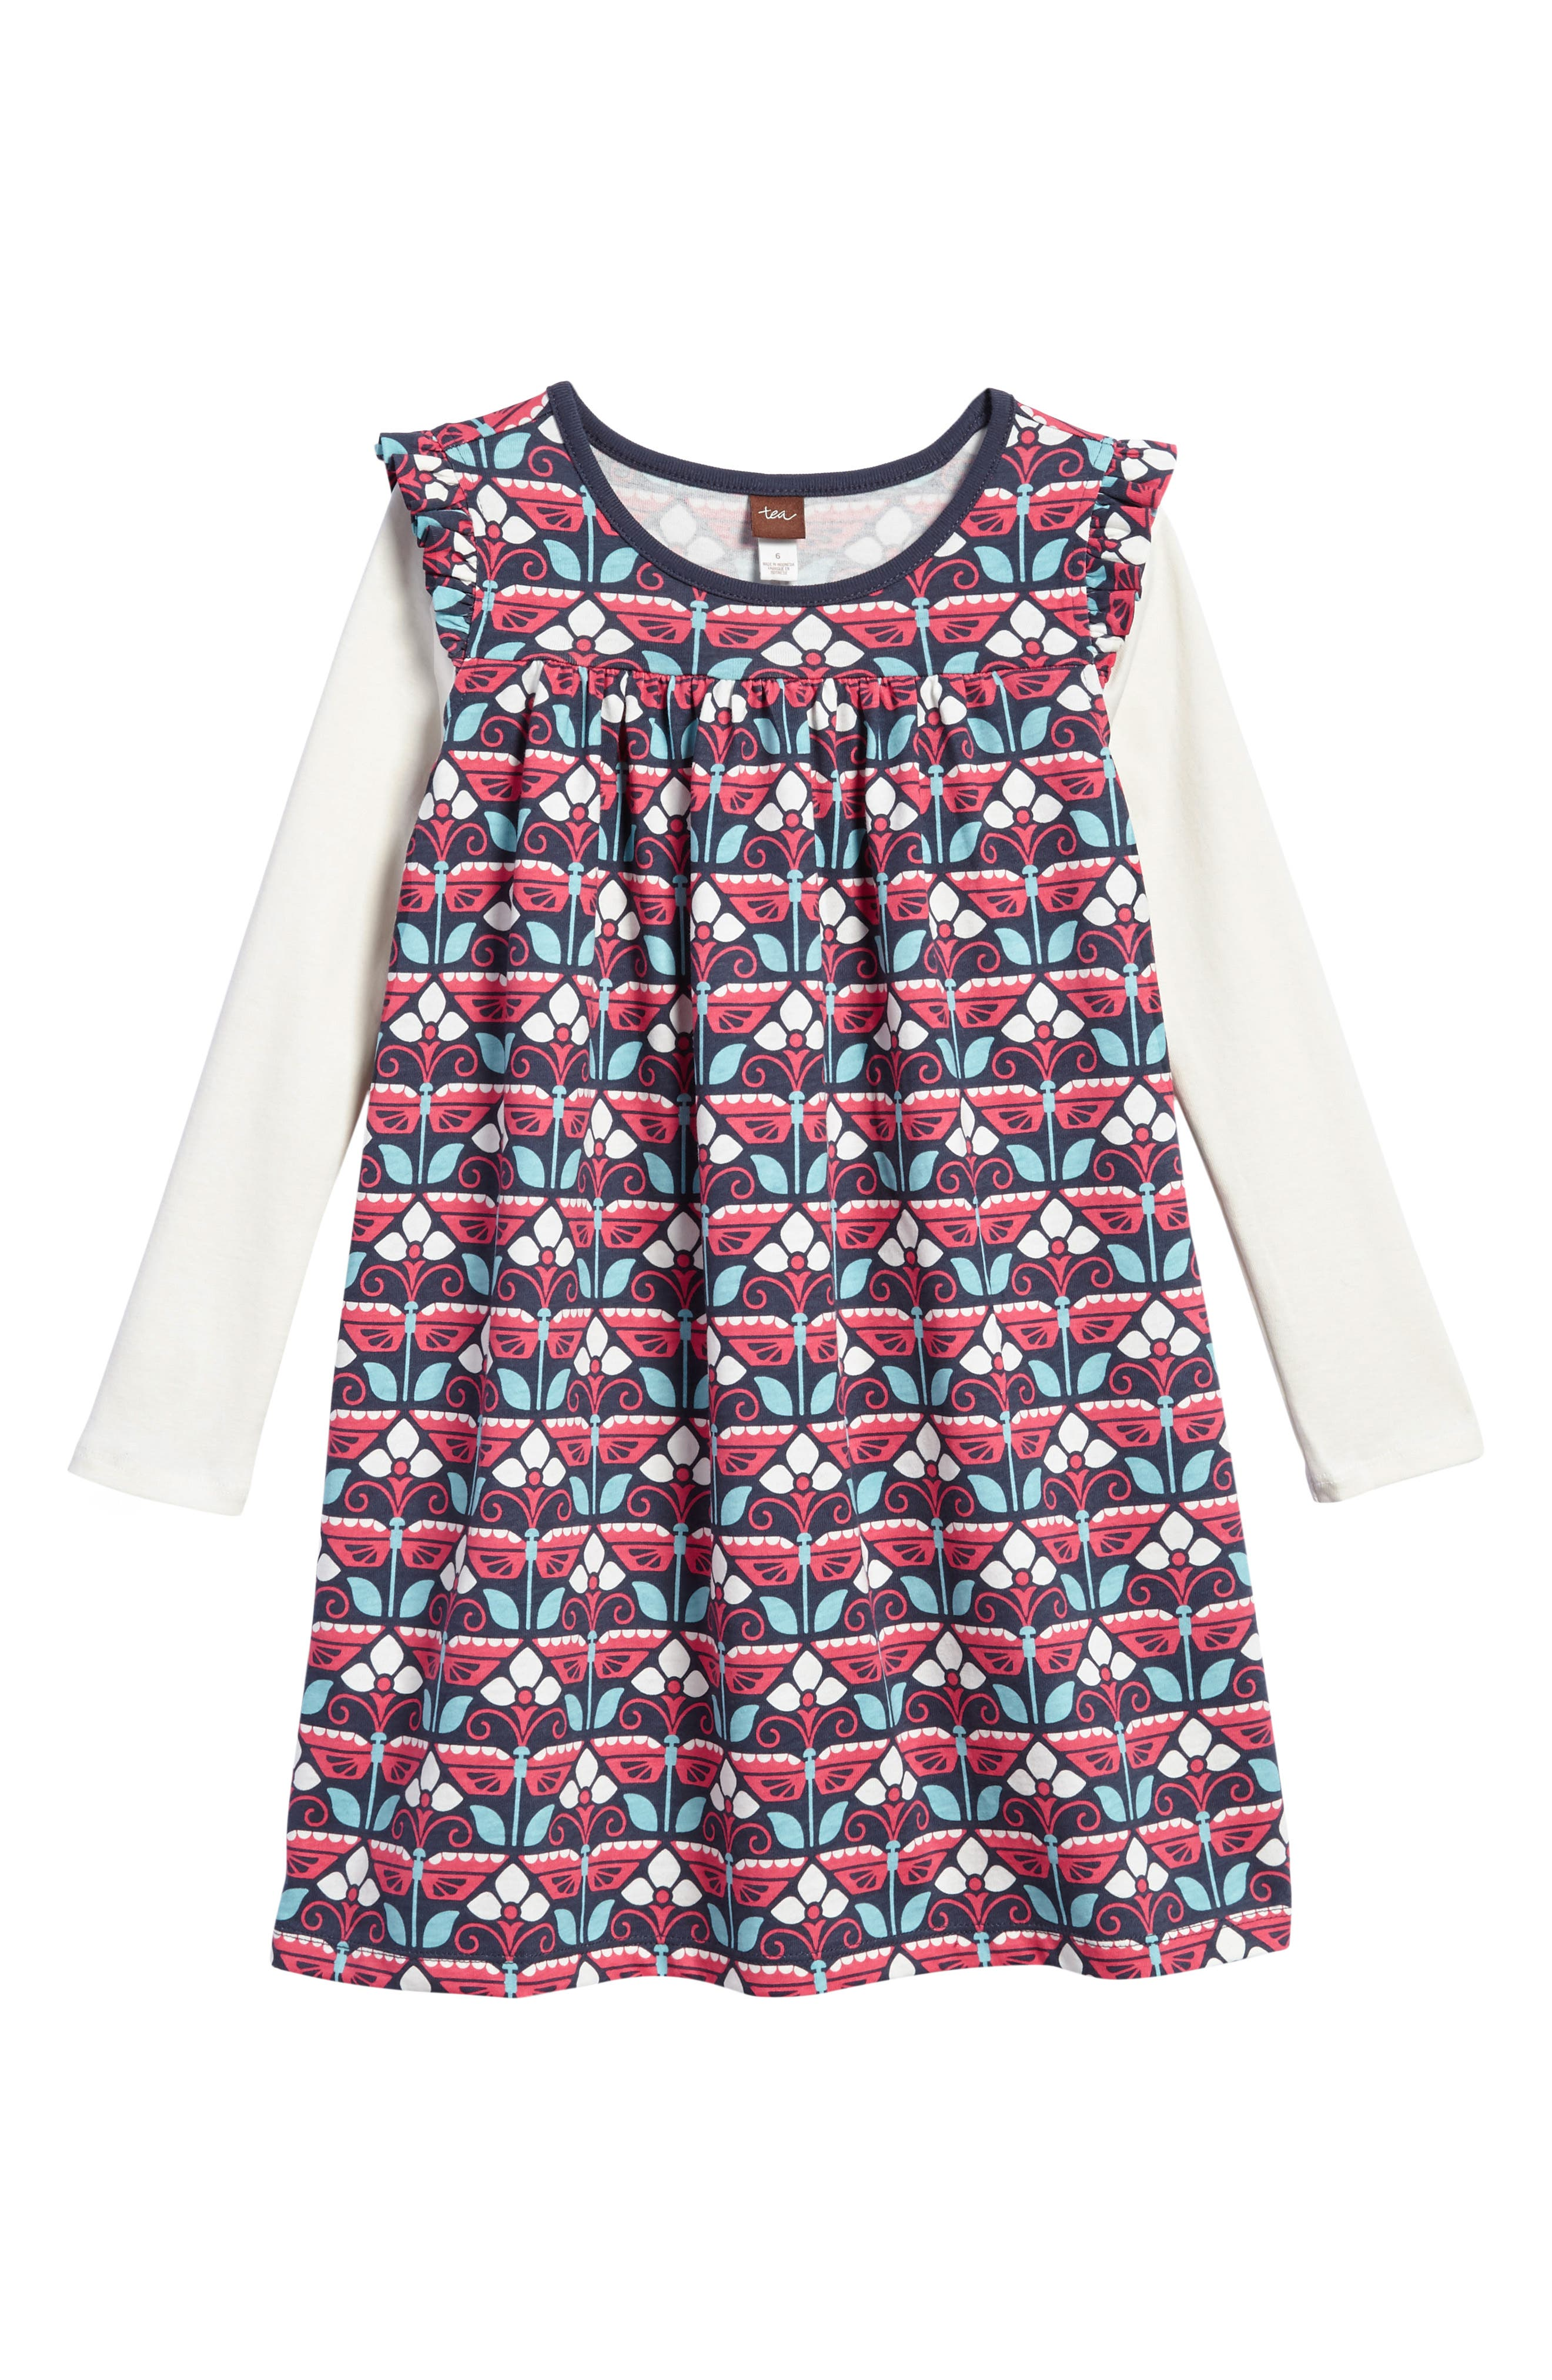 Main Image - Tea Collection Kaleidoscope Dress (Toddler Girls, Little Girls & Big Girls)